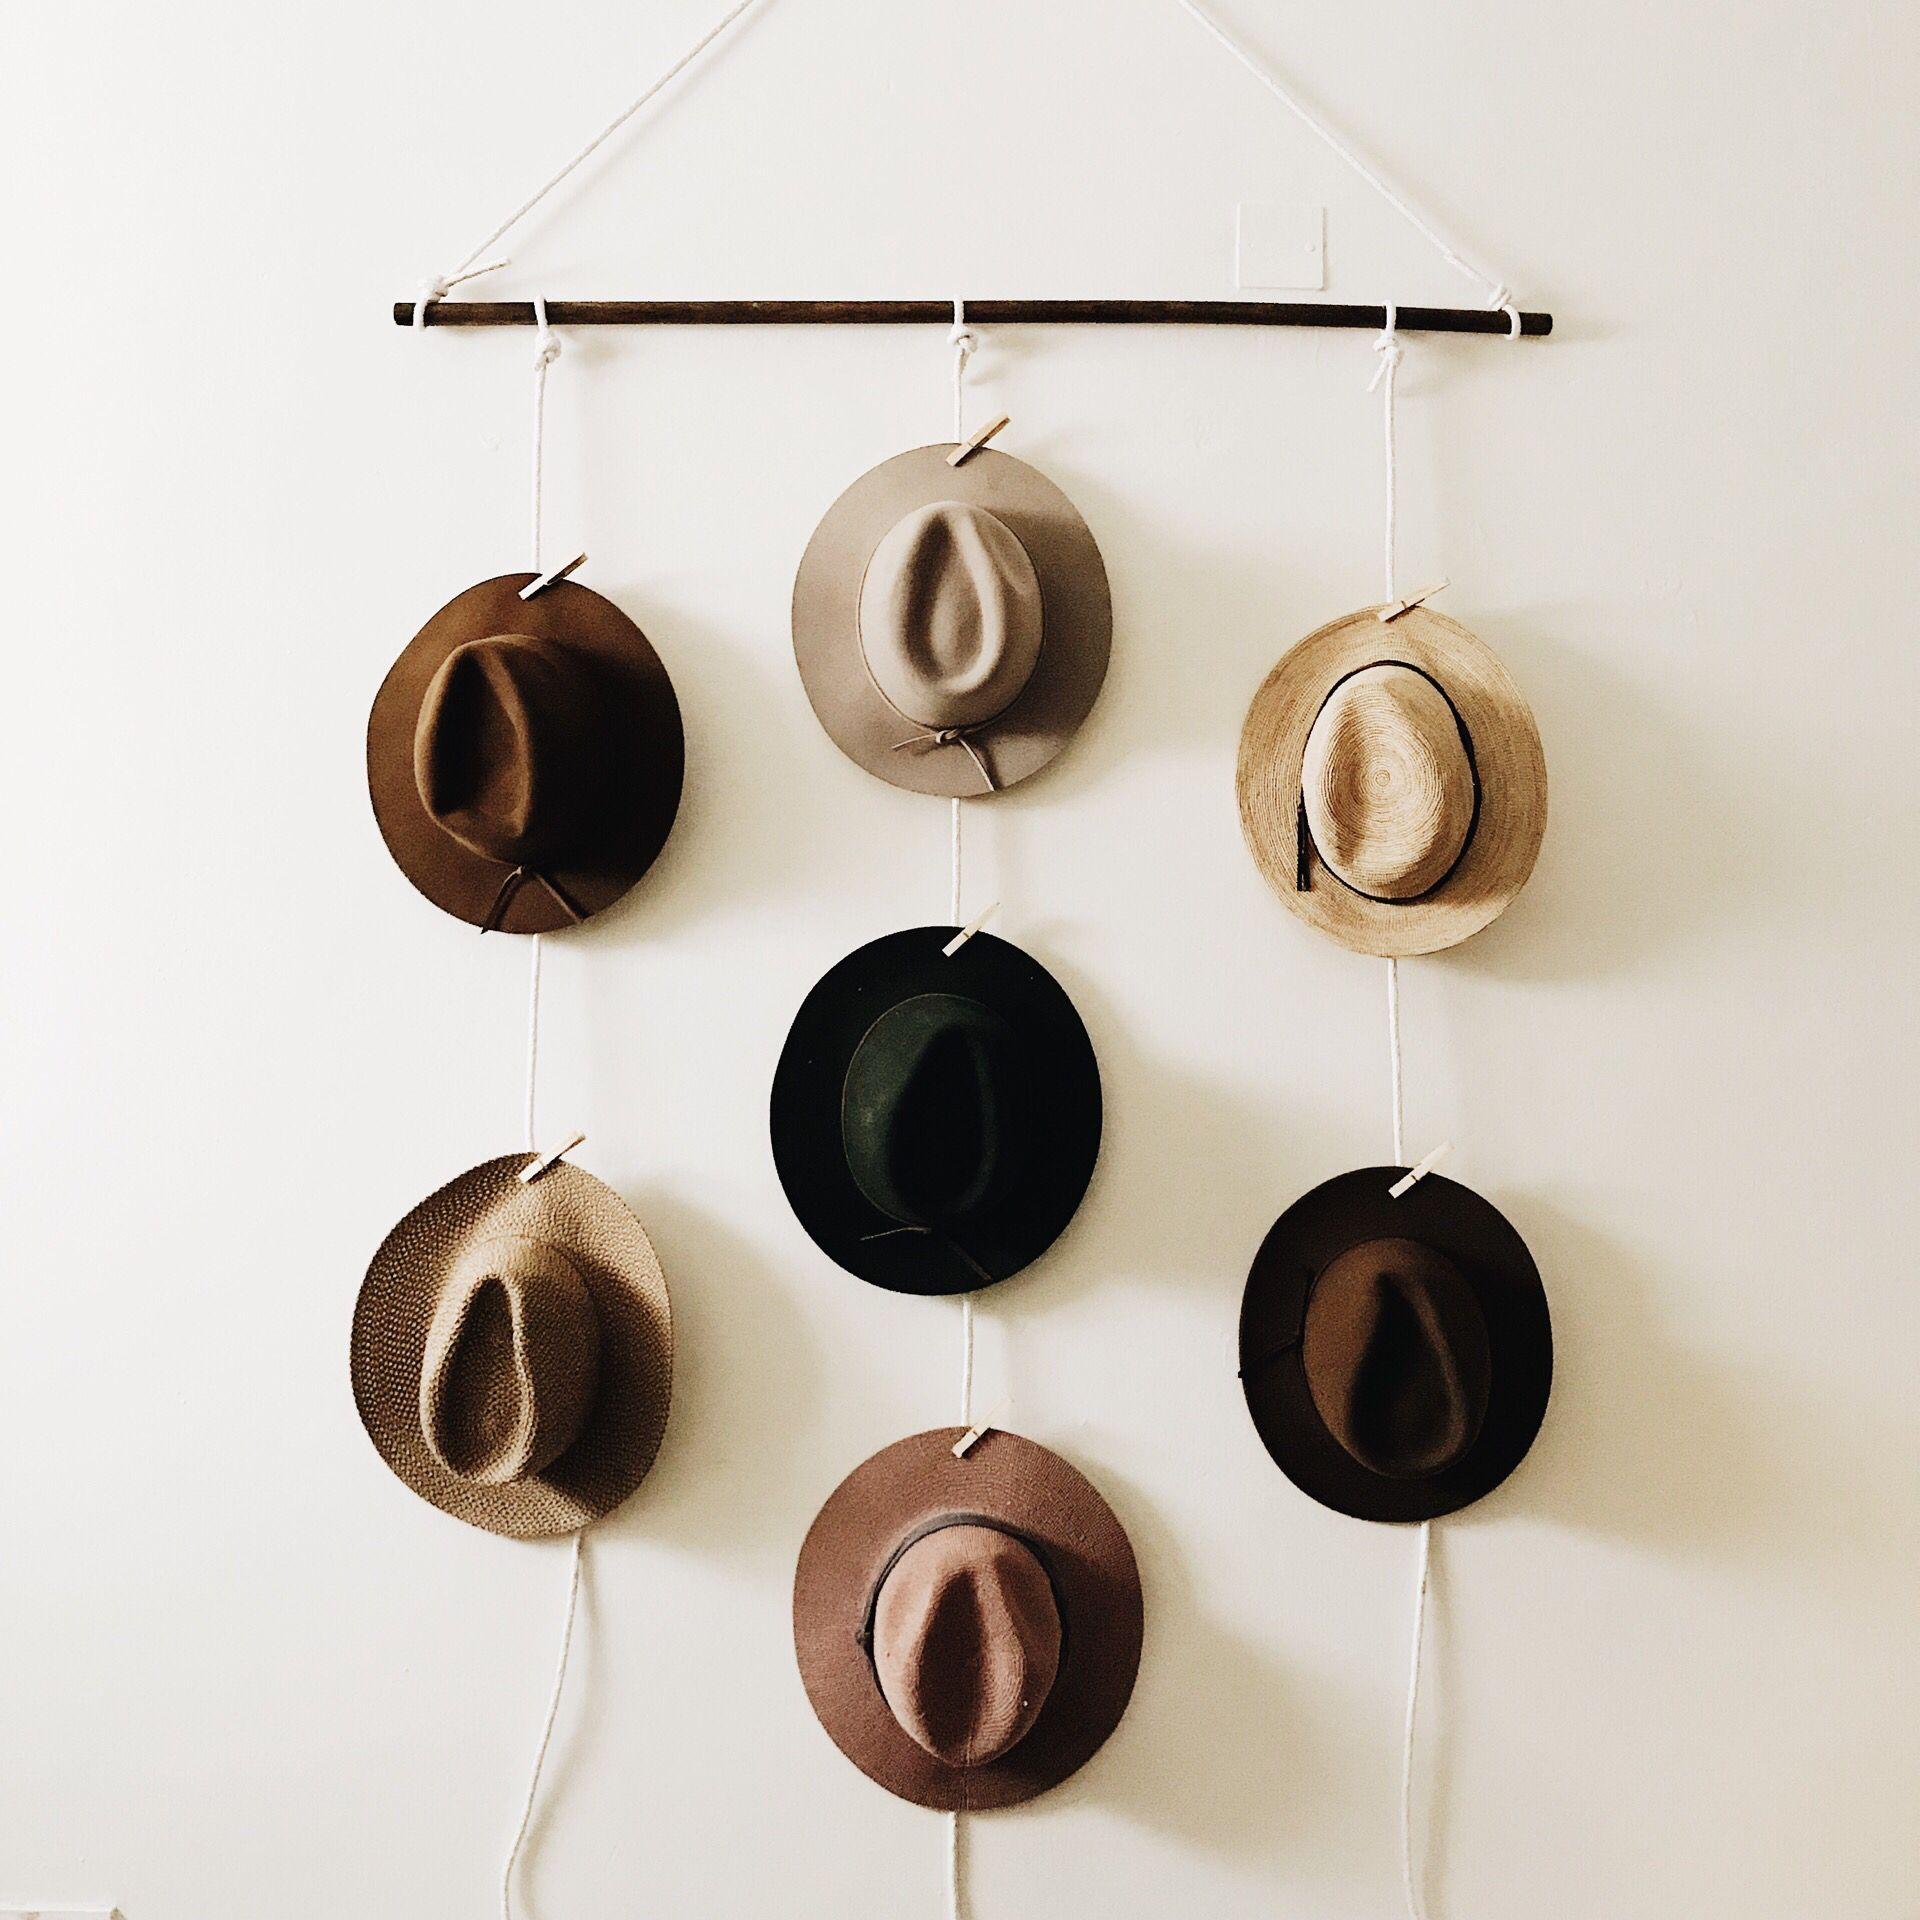 Diy Hat Holder Diy Hat Holder Diy Hat Hanger Diy Wall Decoration